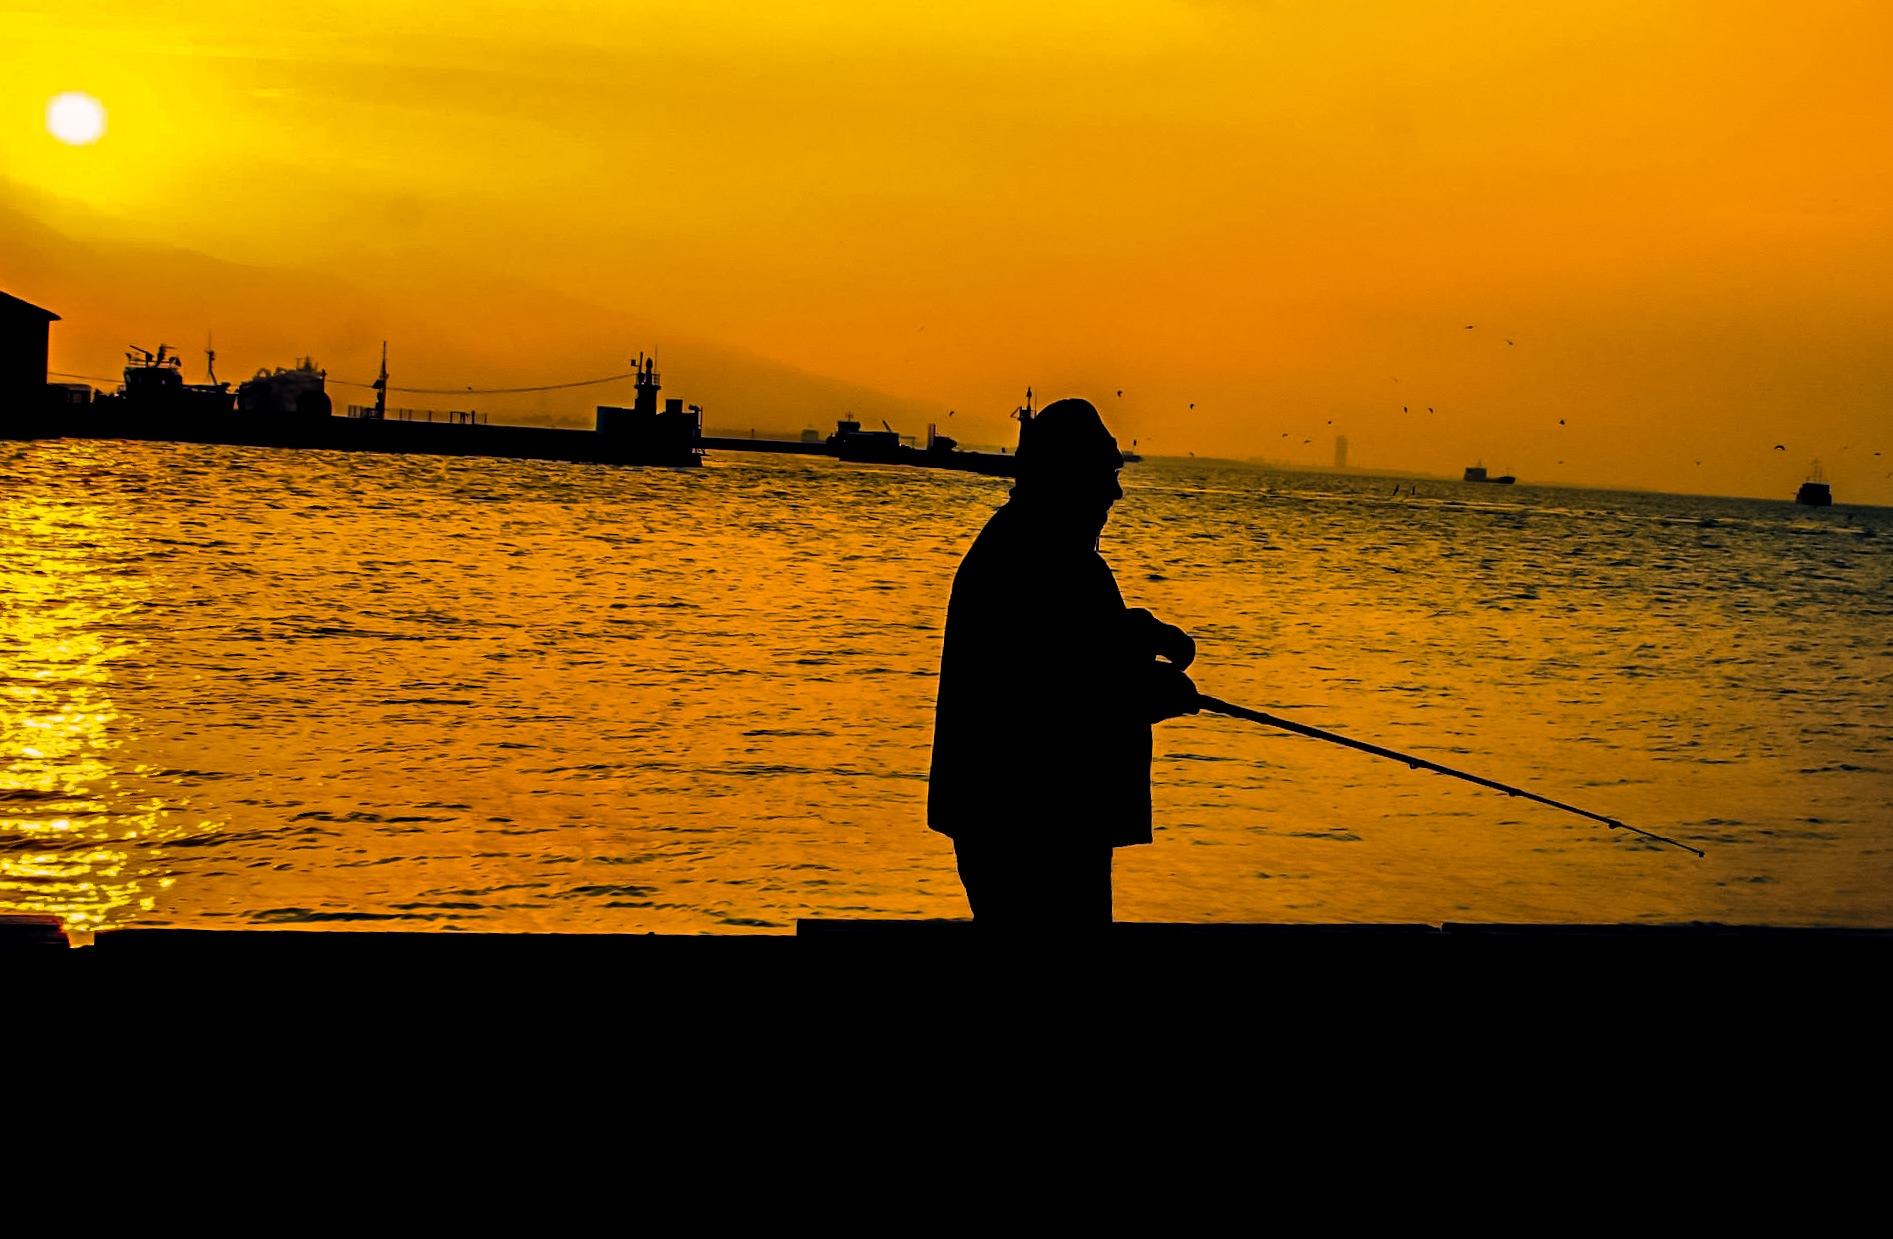 Fisher silhouette  by Oğuzhan Tekbaş